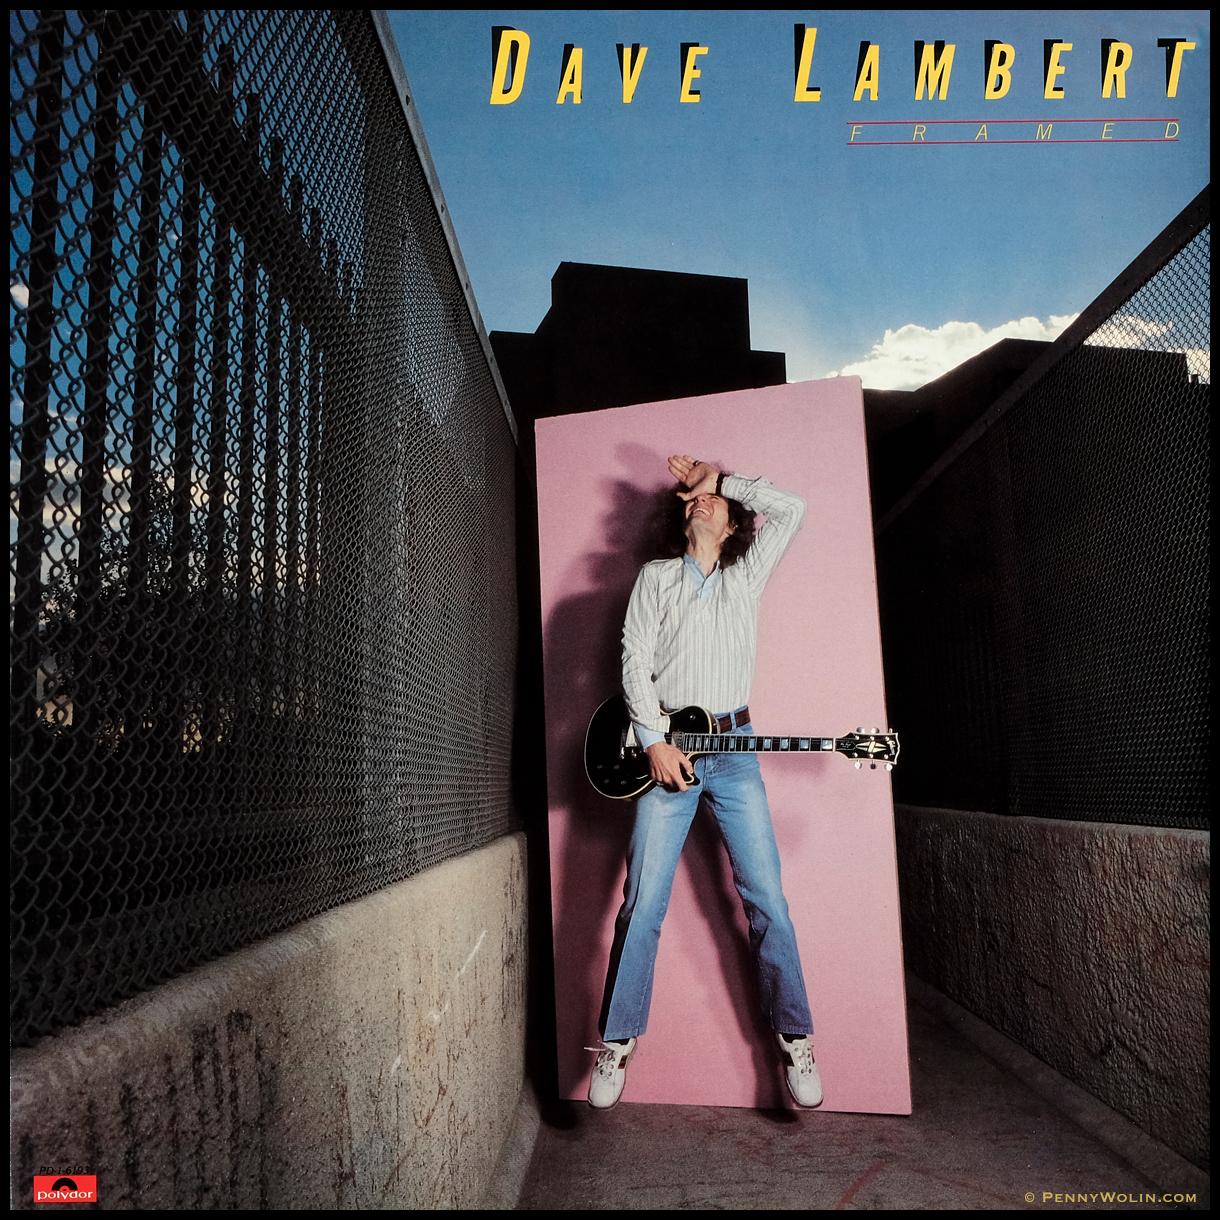 Dave Lambert, Polydor Records